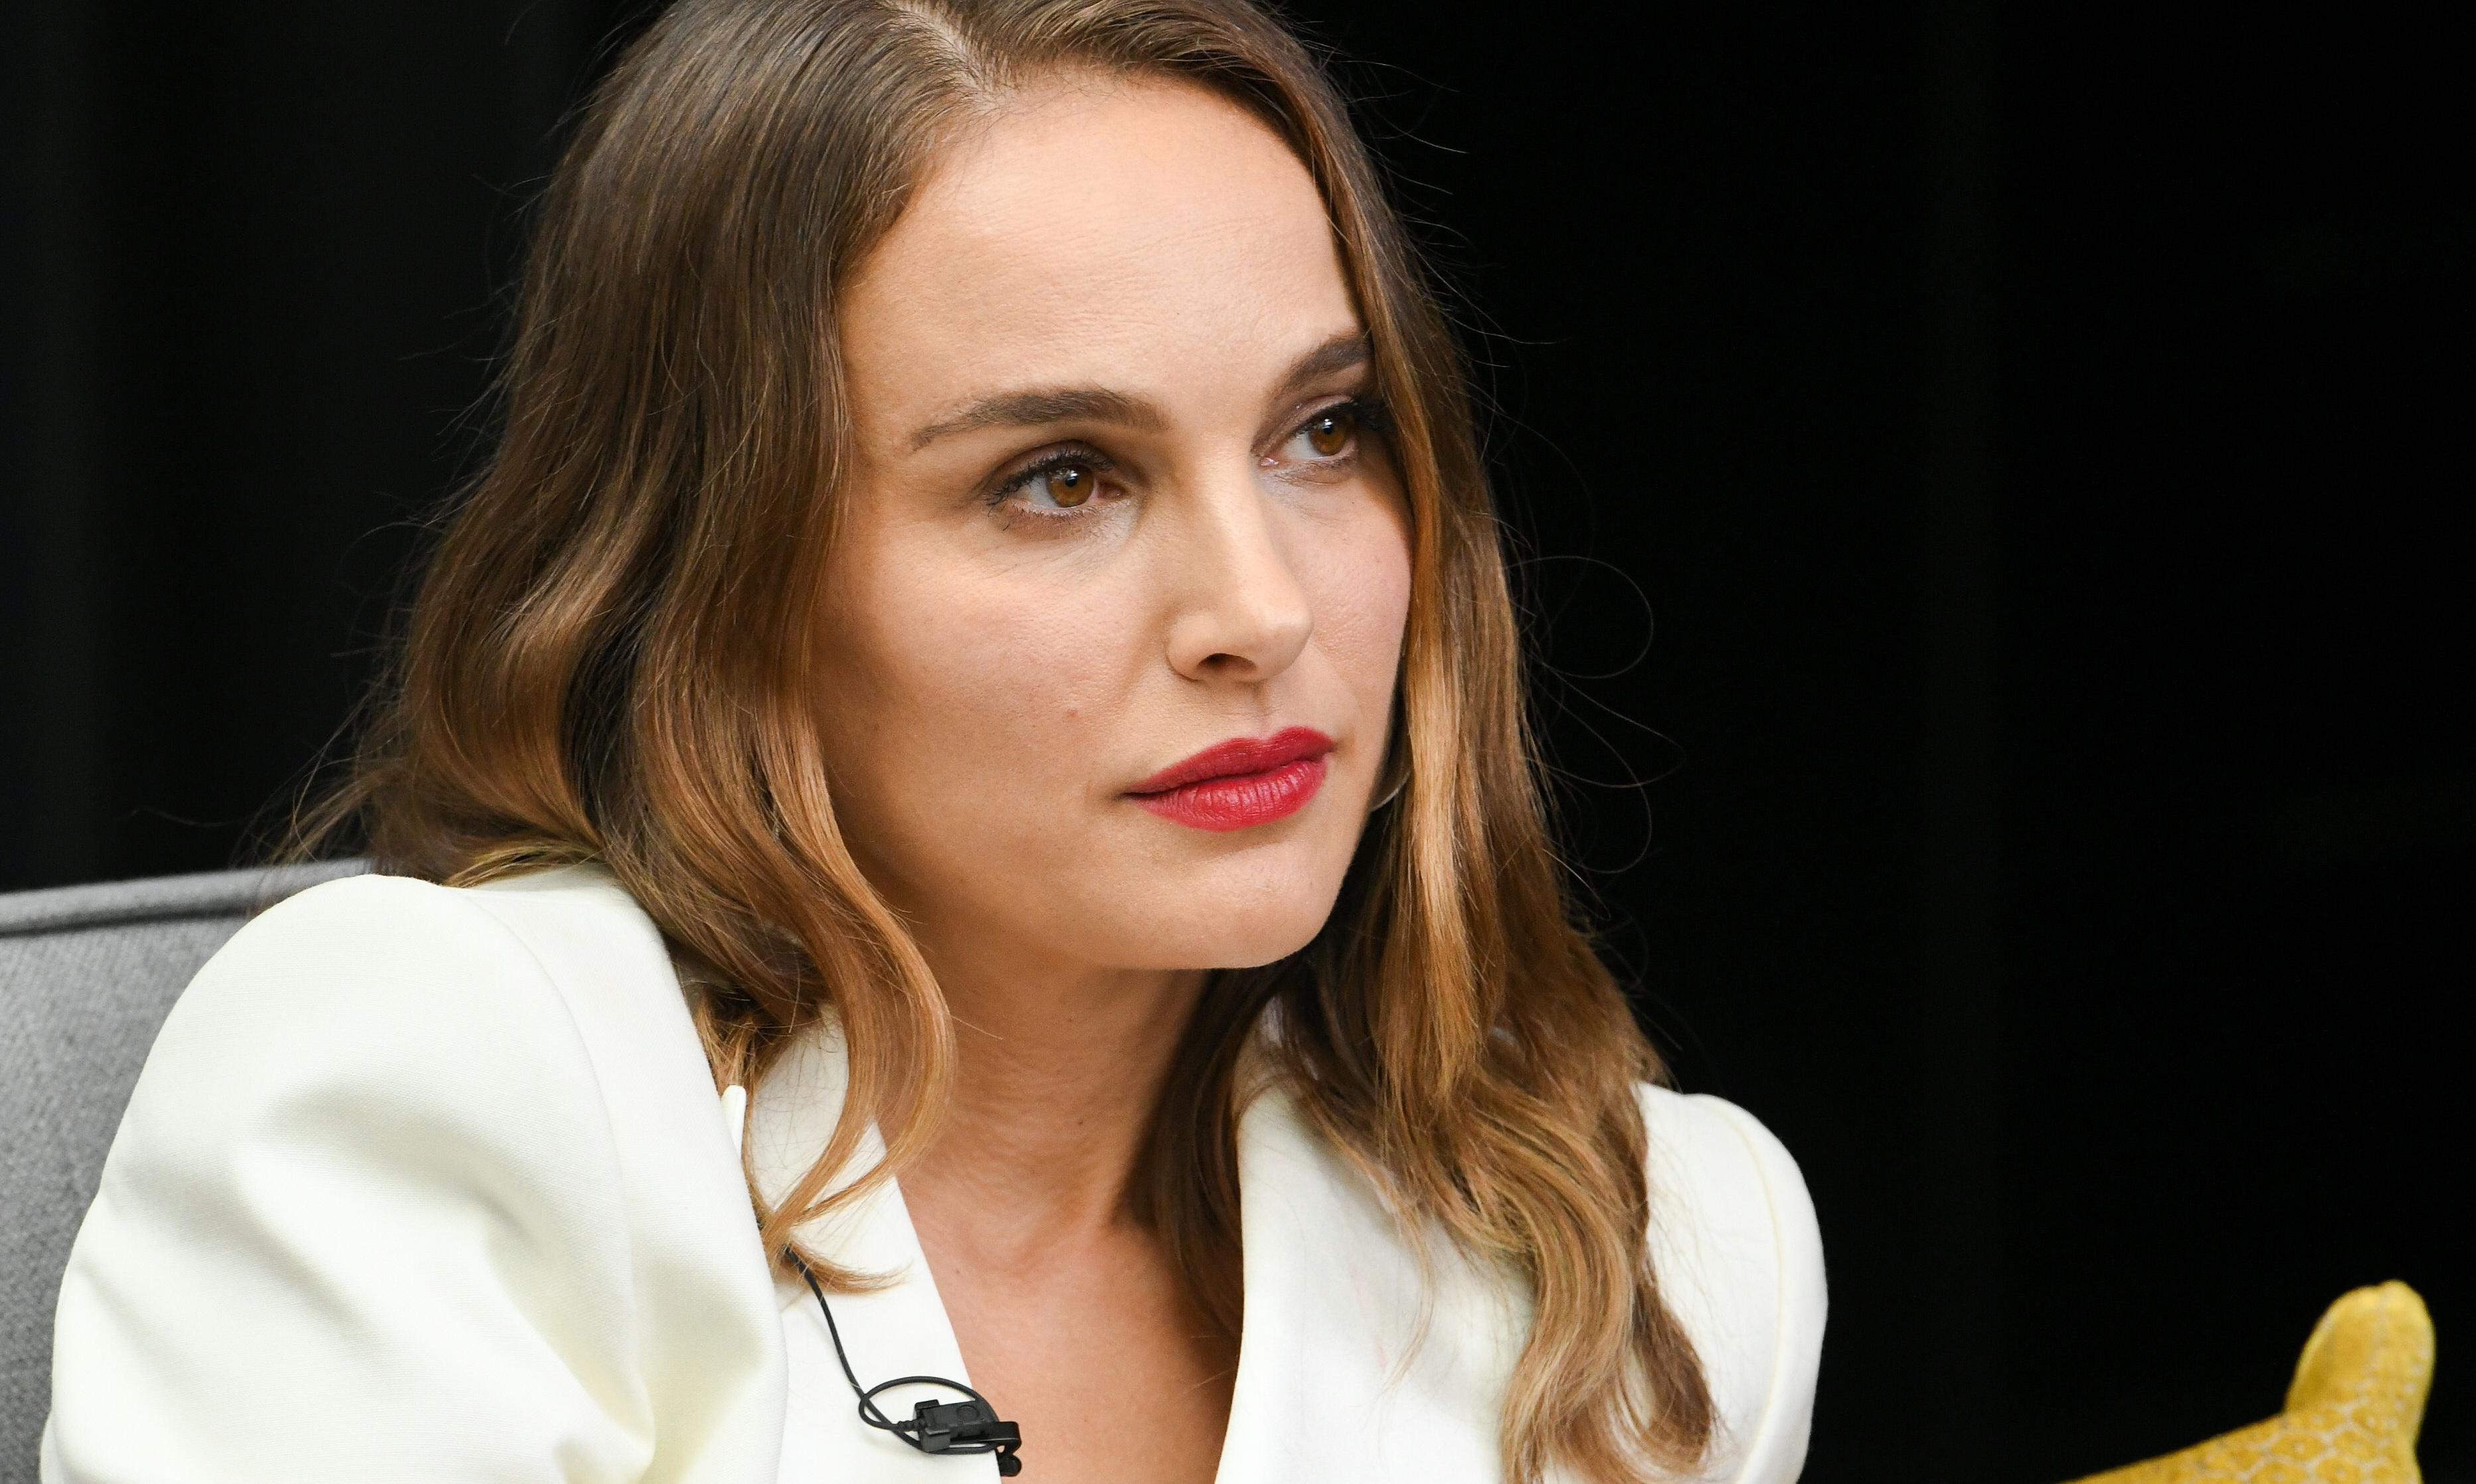 Natalie Portman criticises 'creepy' Moby over 'disturbing' account of friendship